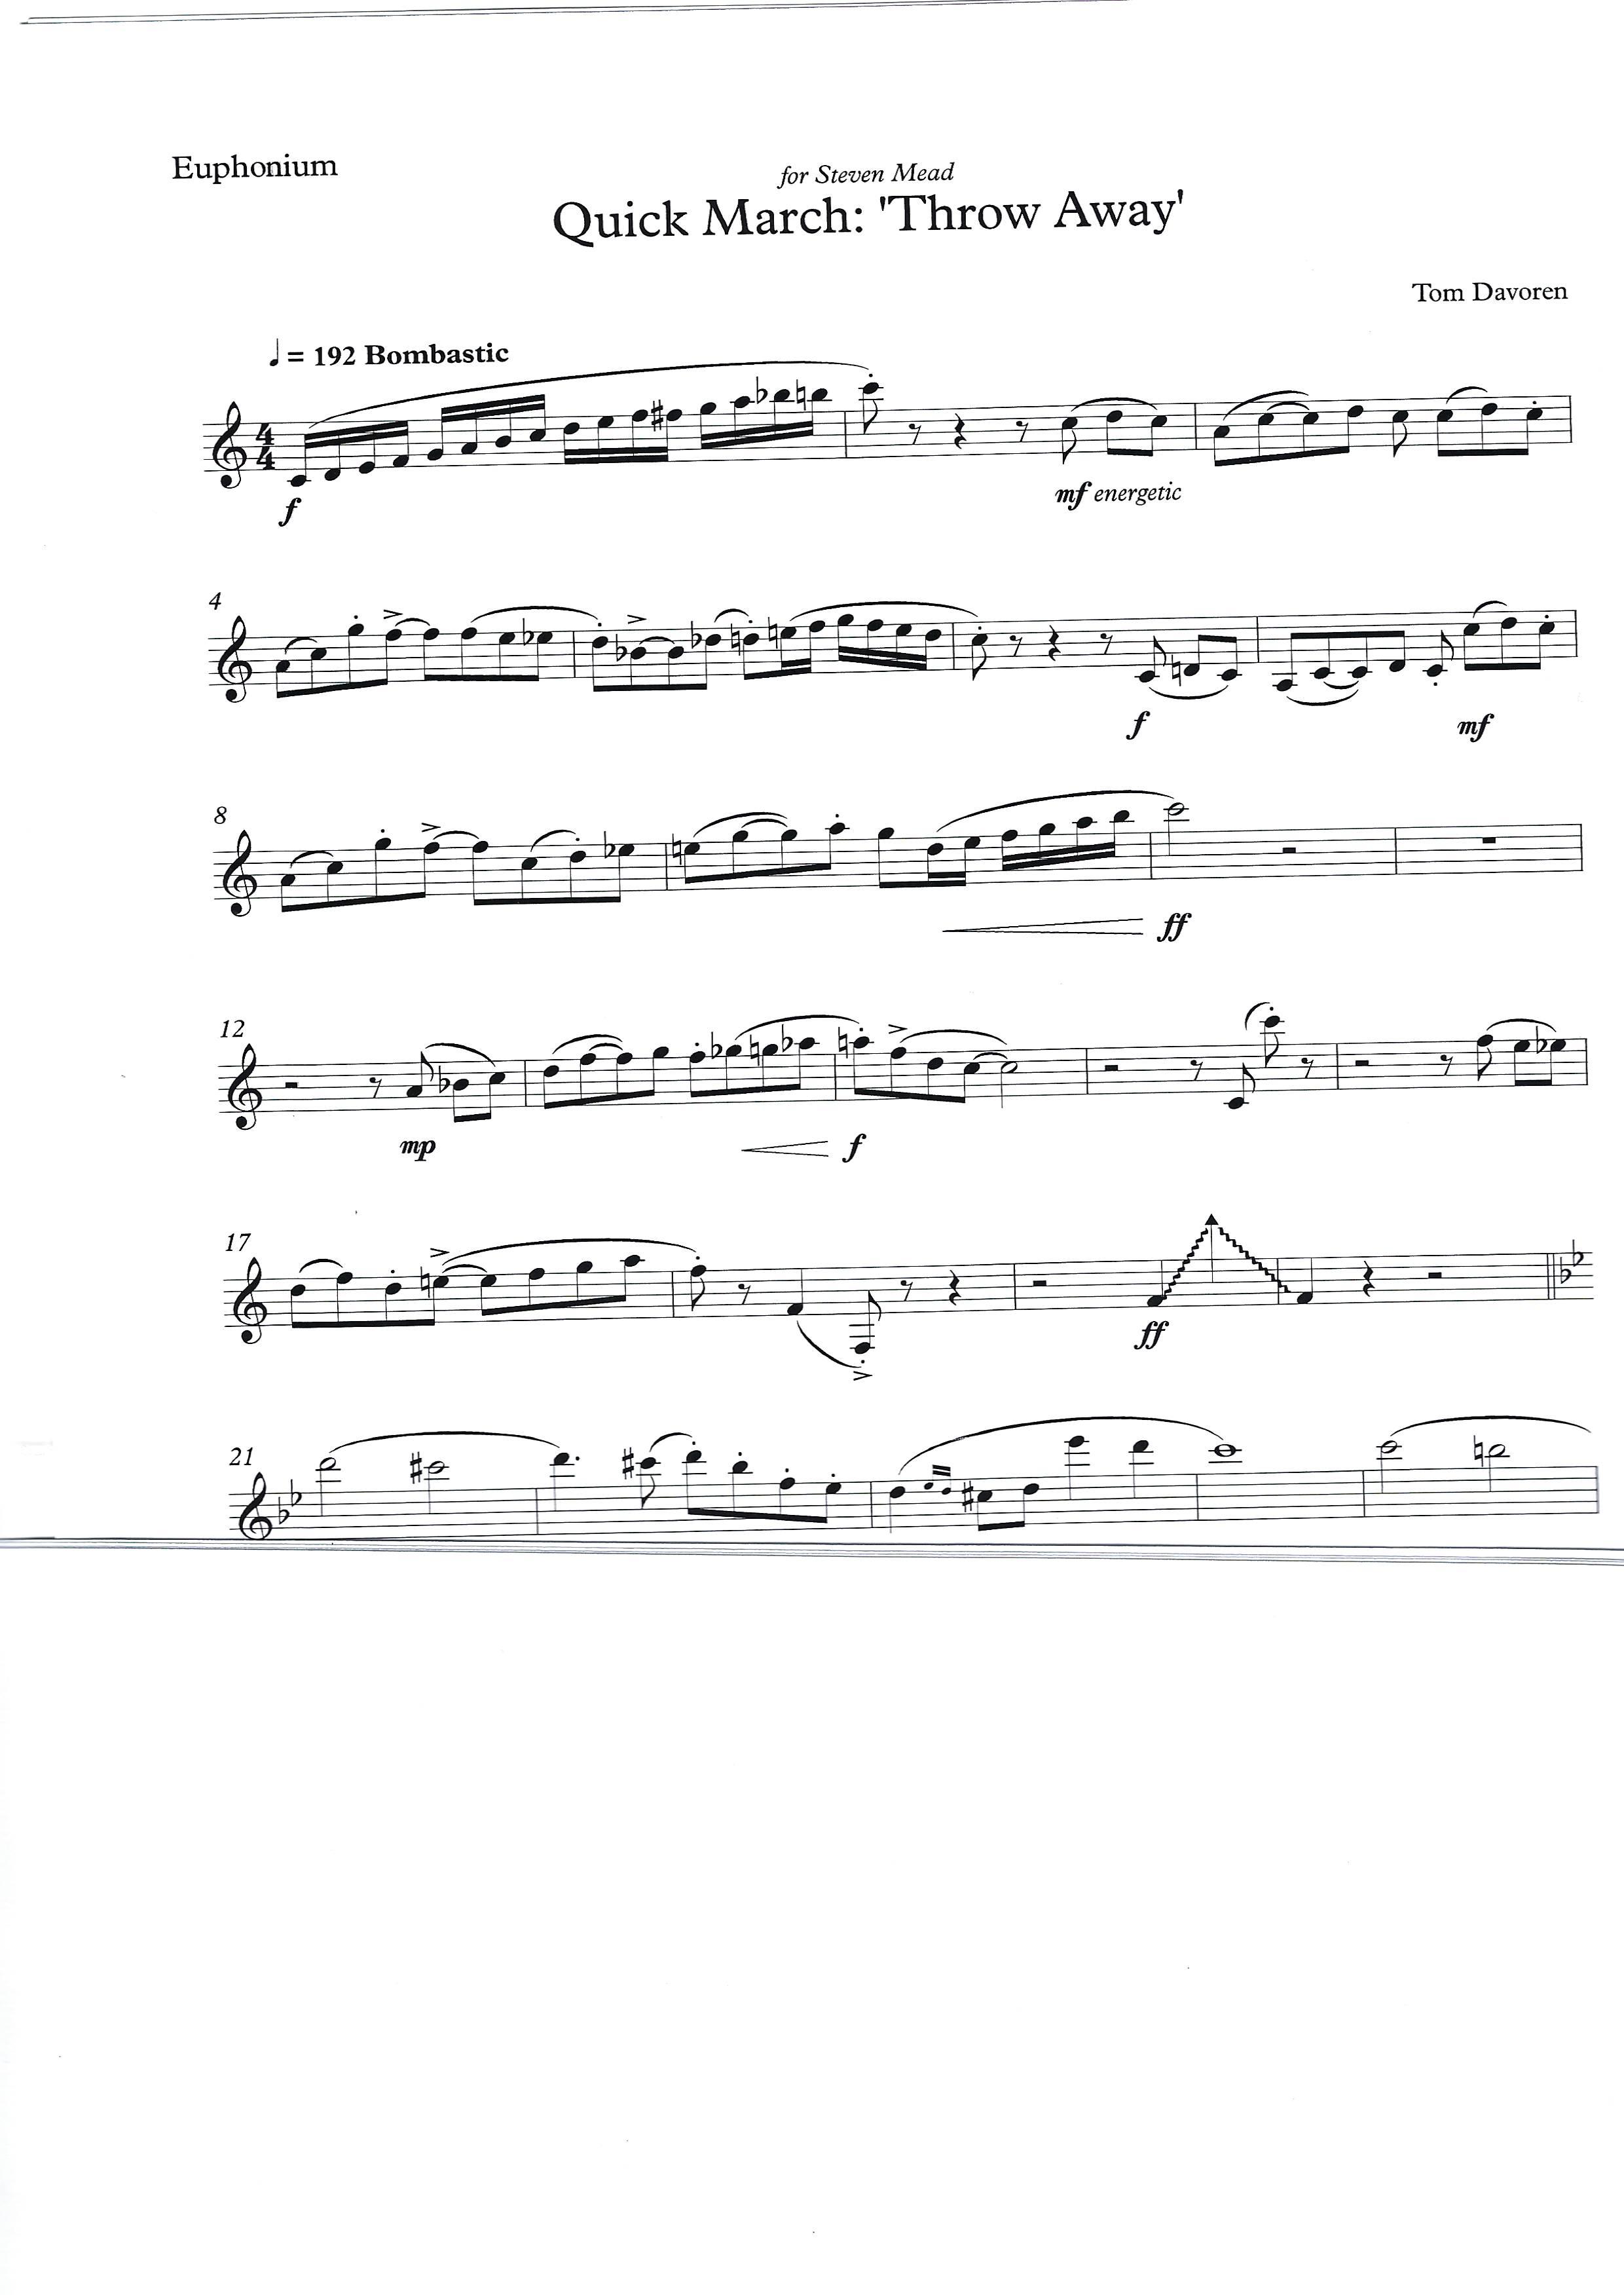 Solo De Concurso - Miguel Yuste - Euphonium and Piano